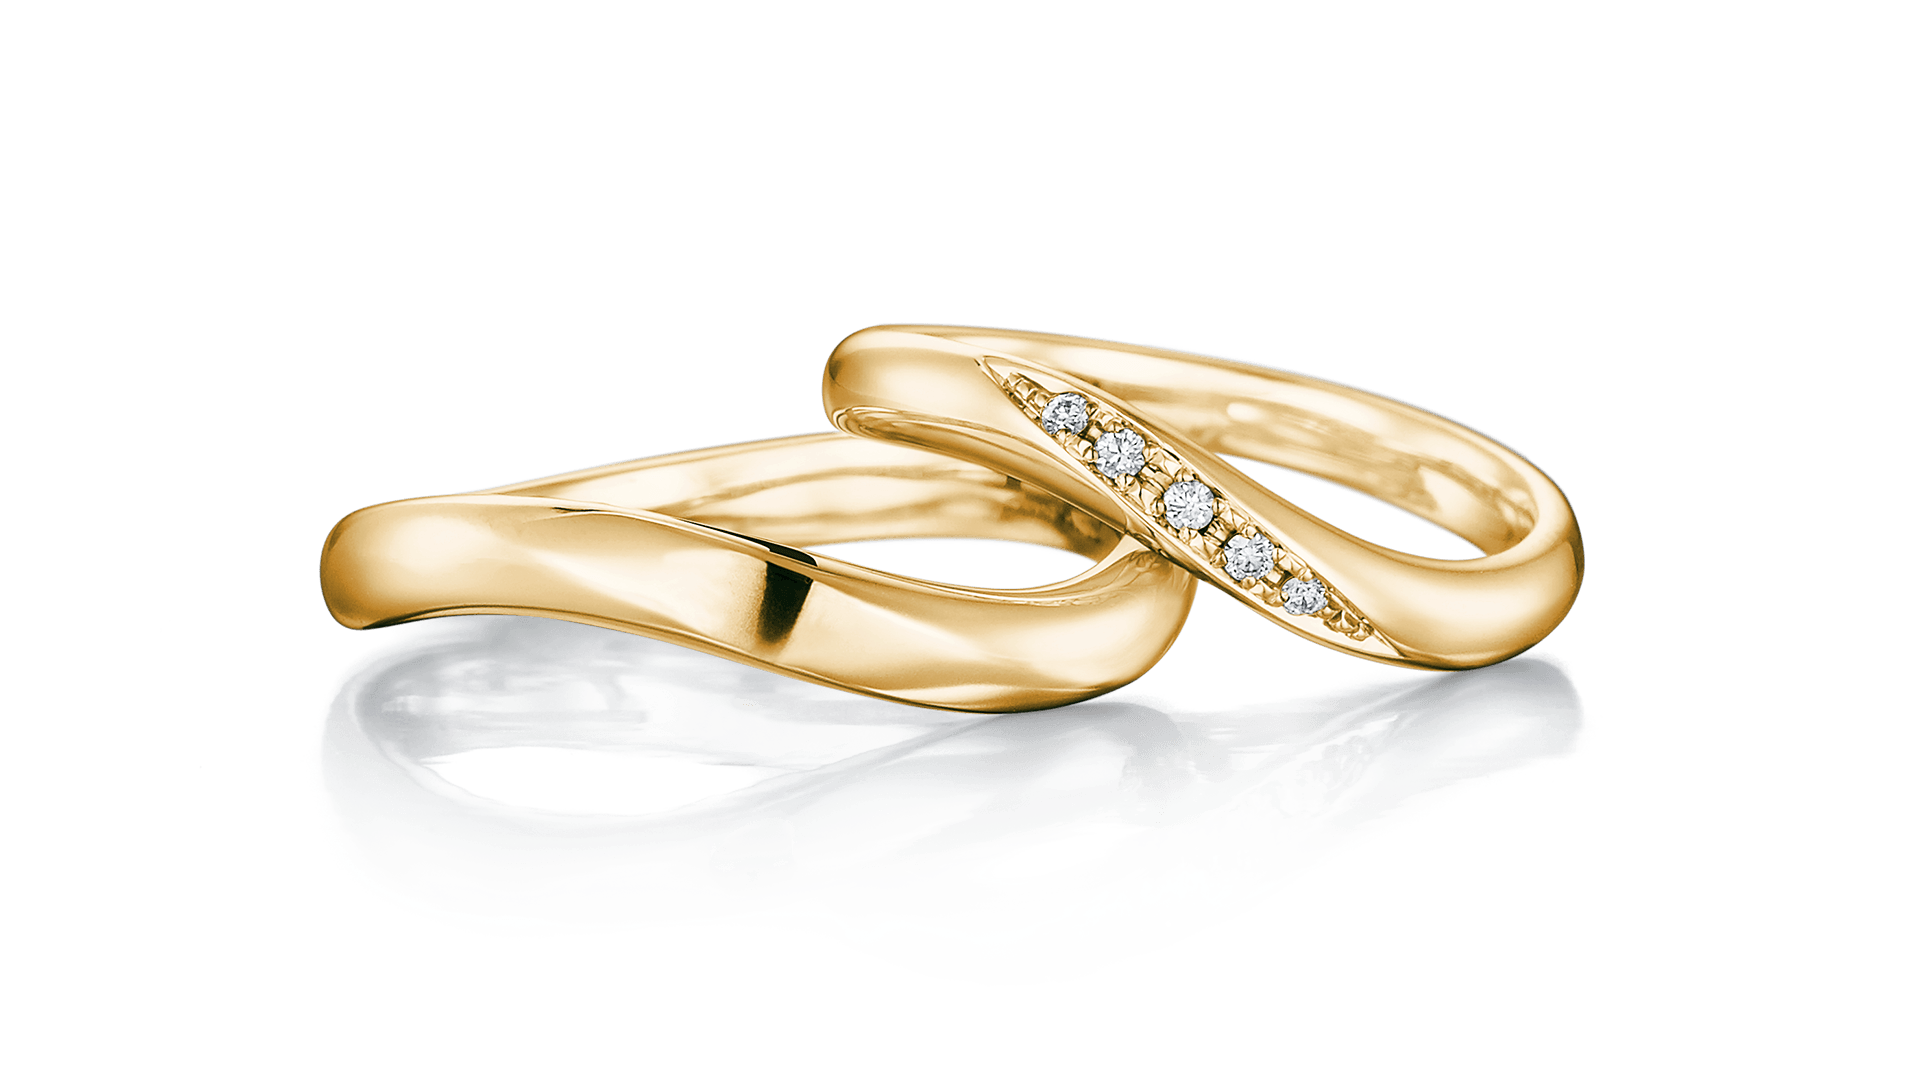 uranus ウラヌス | 結婚指輪サムネイル 1